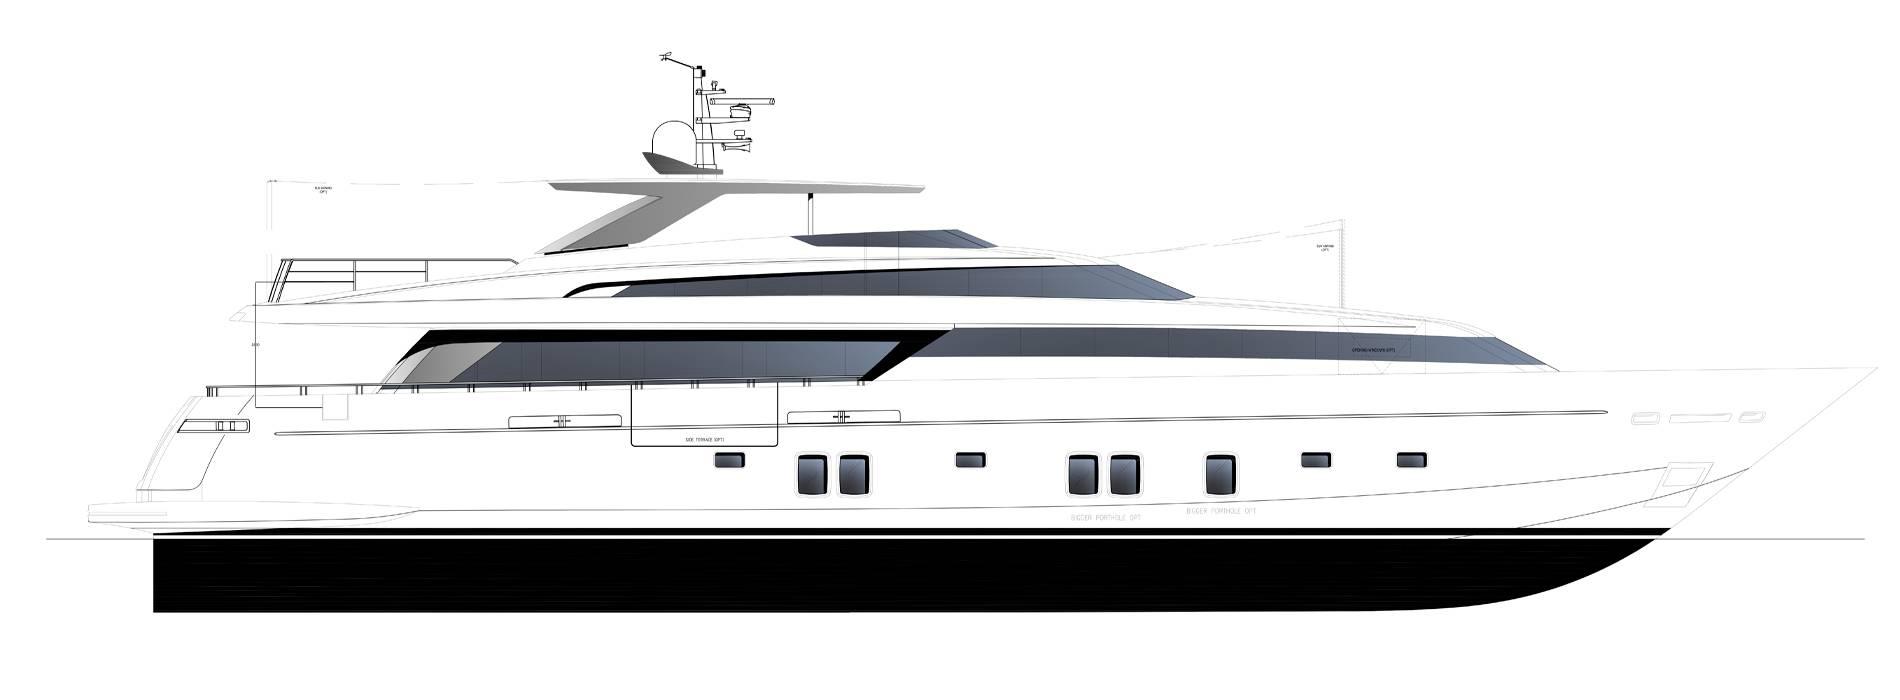 Sanlorenzo Yachts SL118-628 Profile